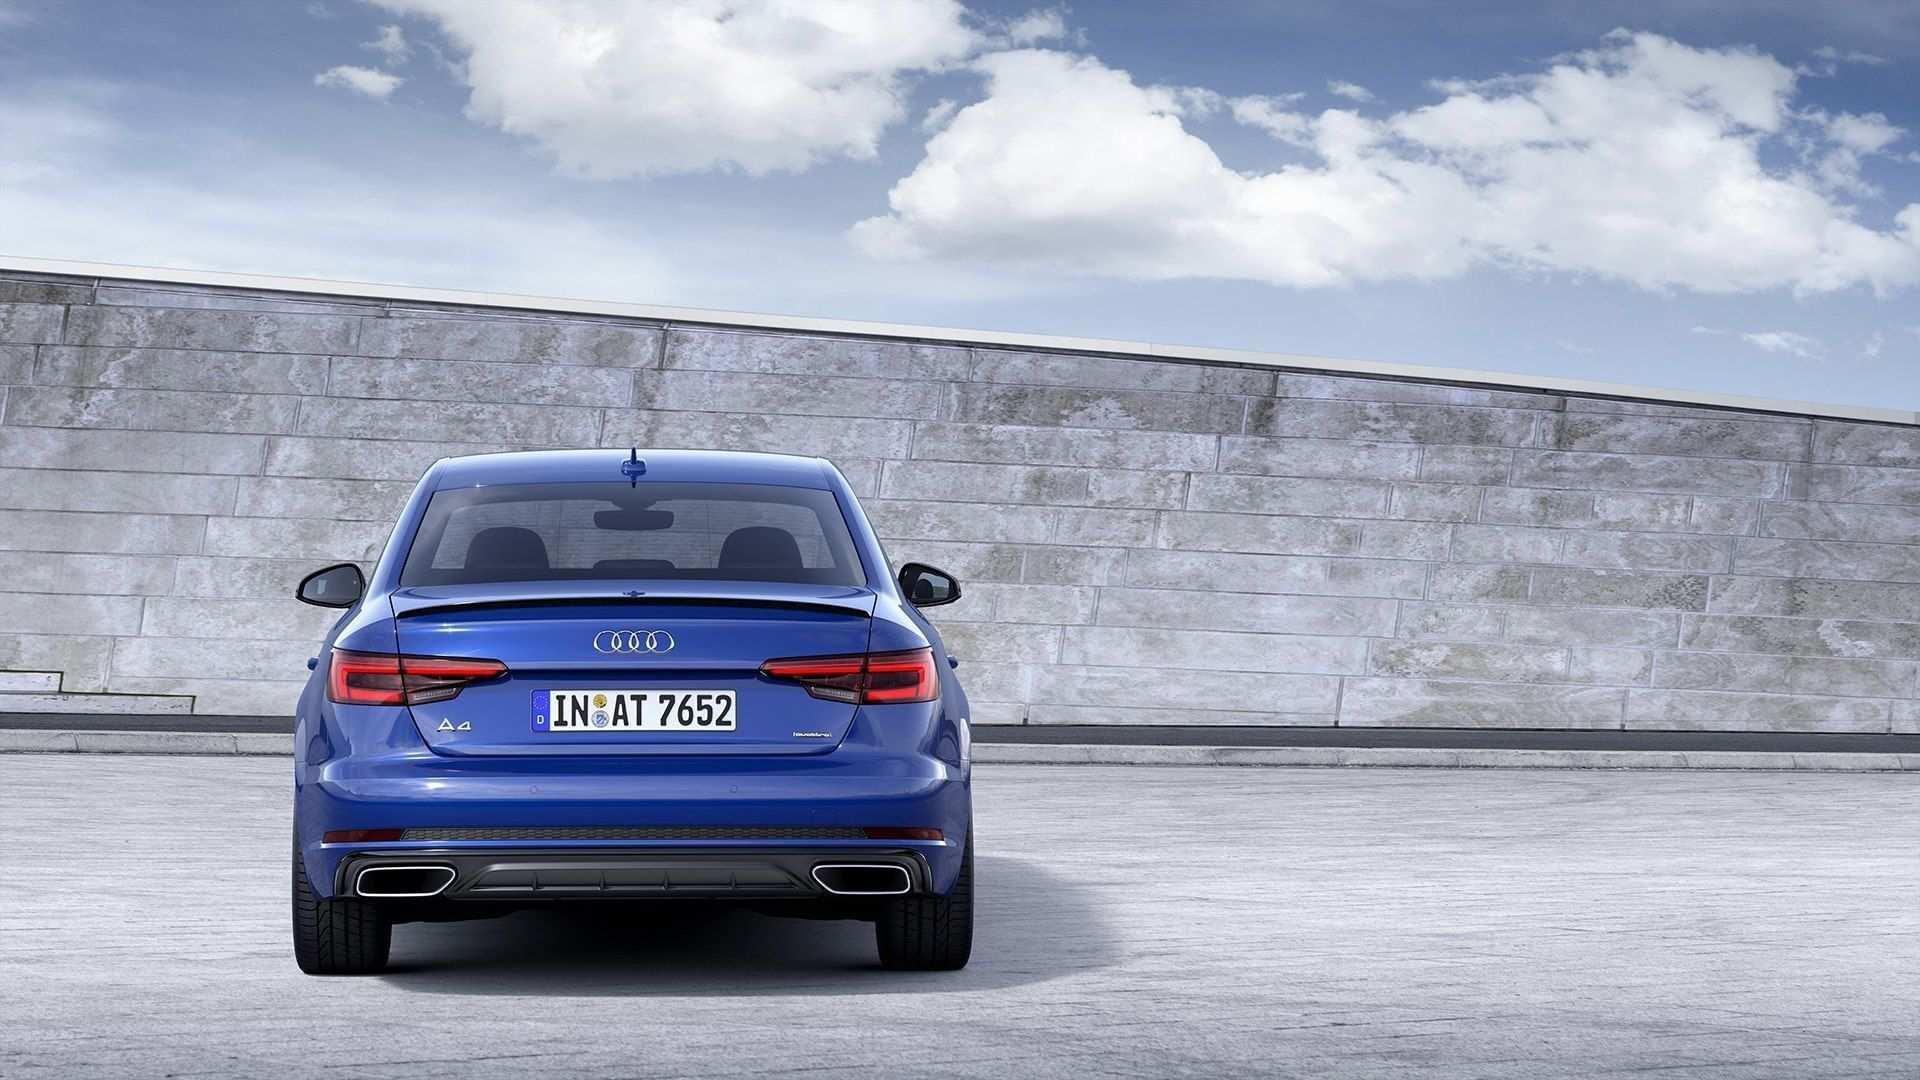 56 New New A4 Audi 2019 Spesification Configurations with New A4 Audi 2019 Spesification